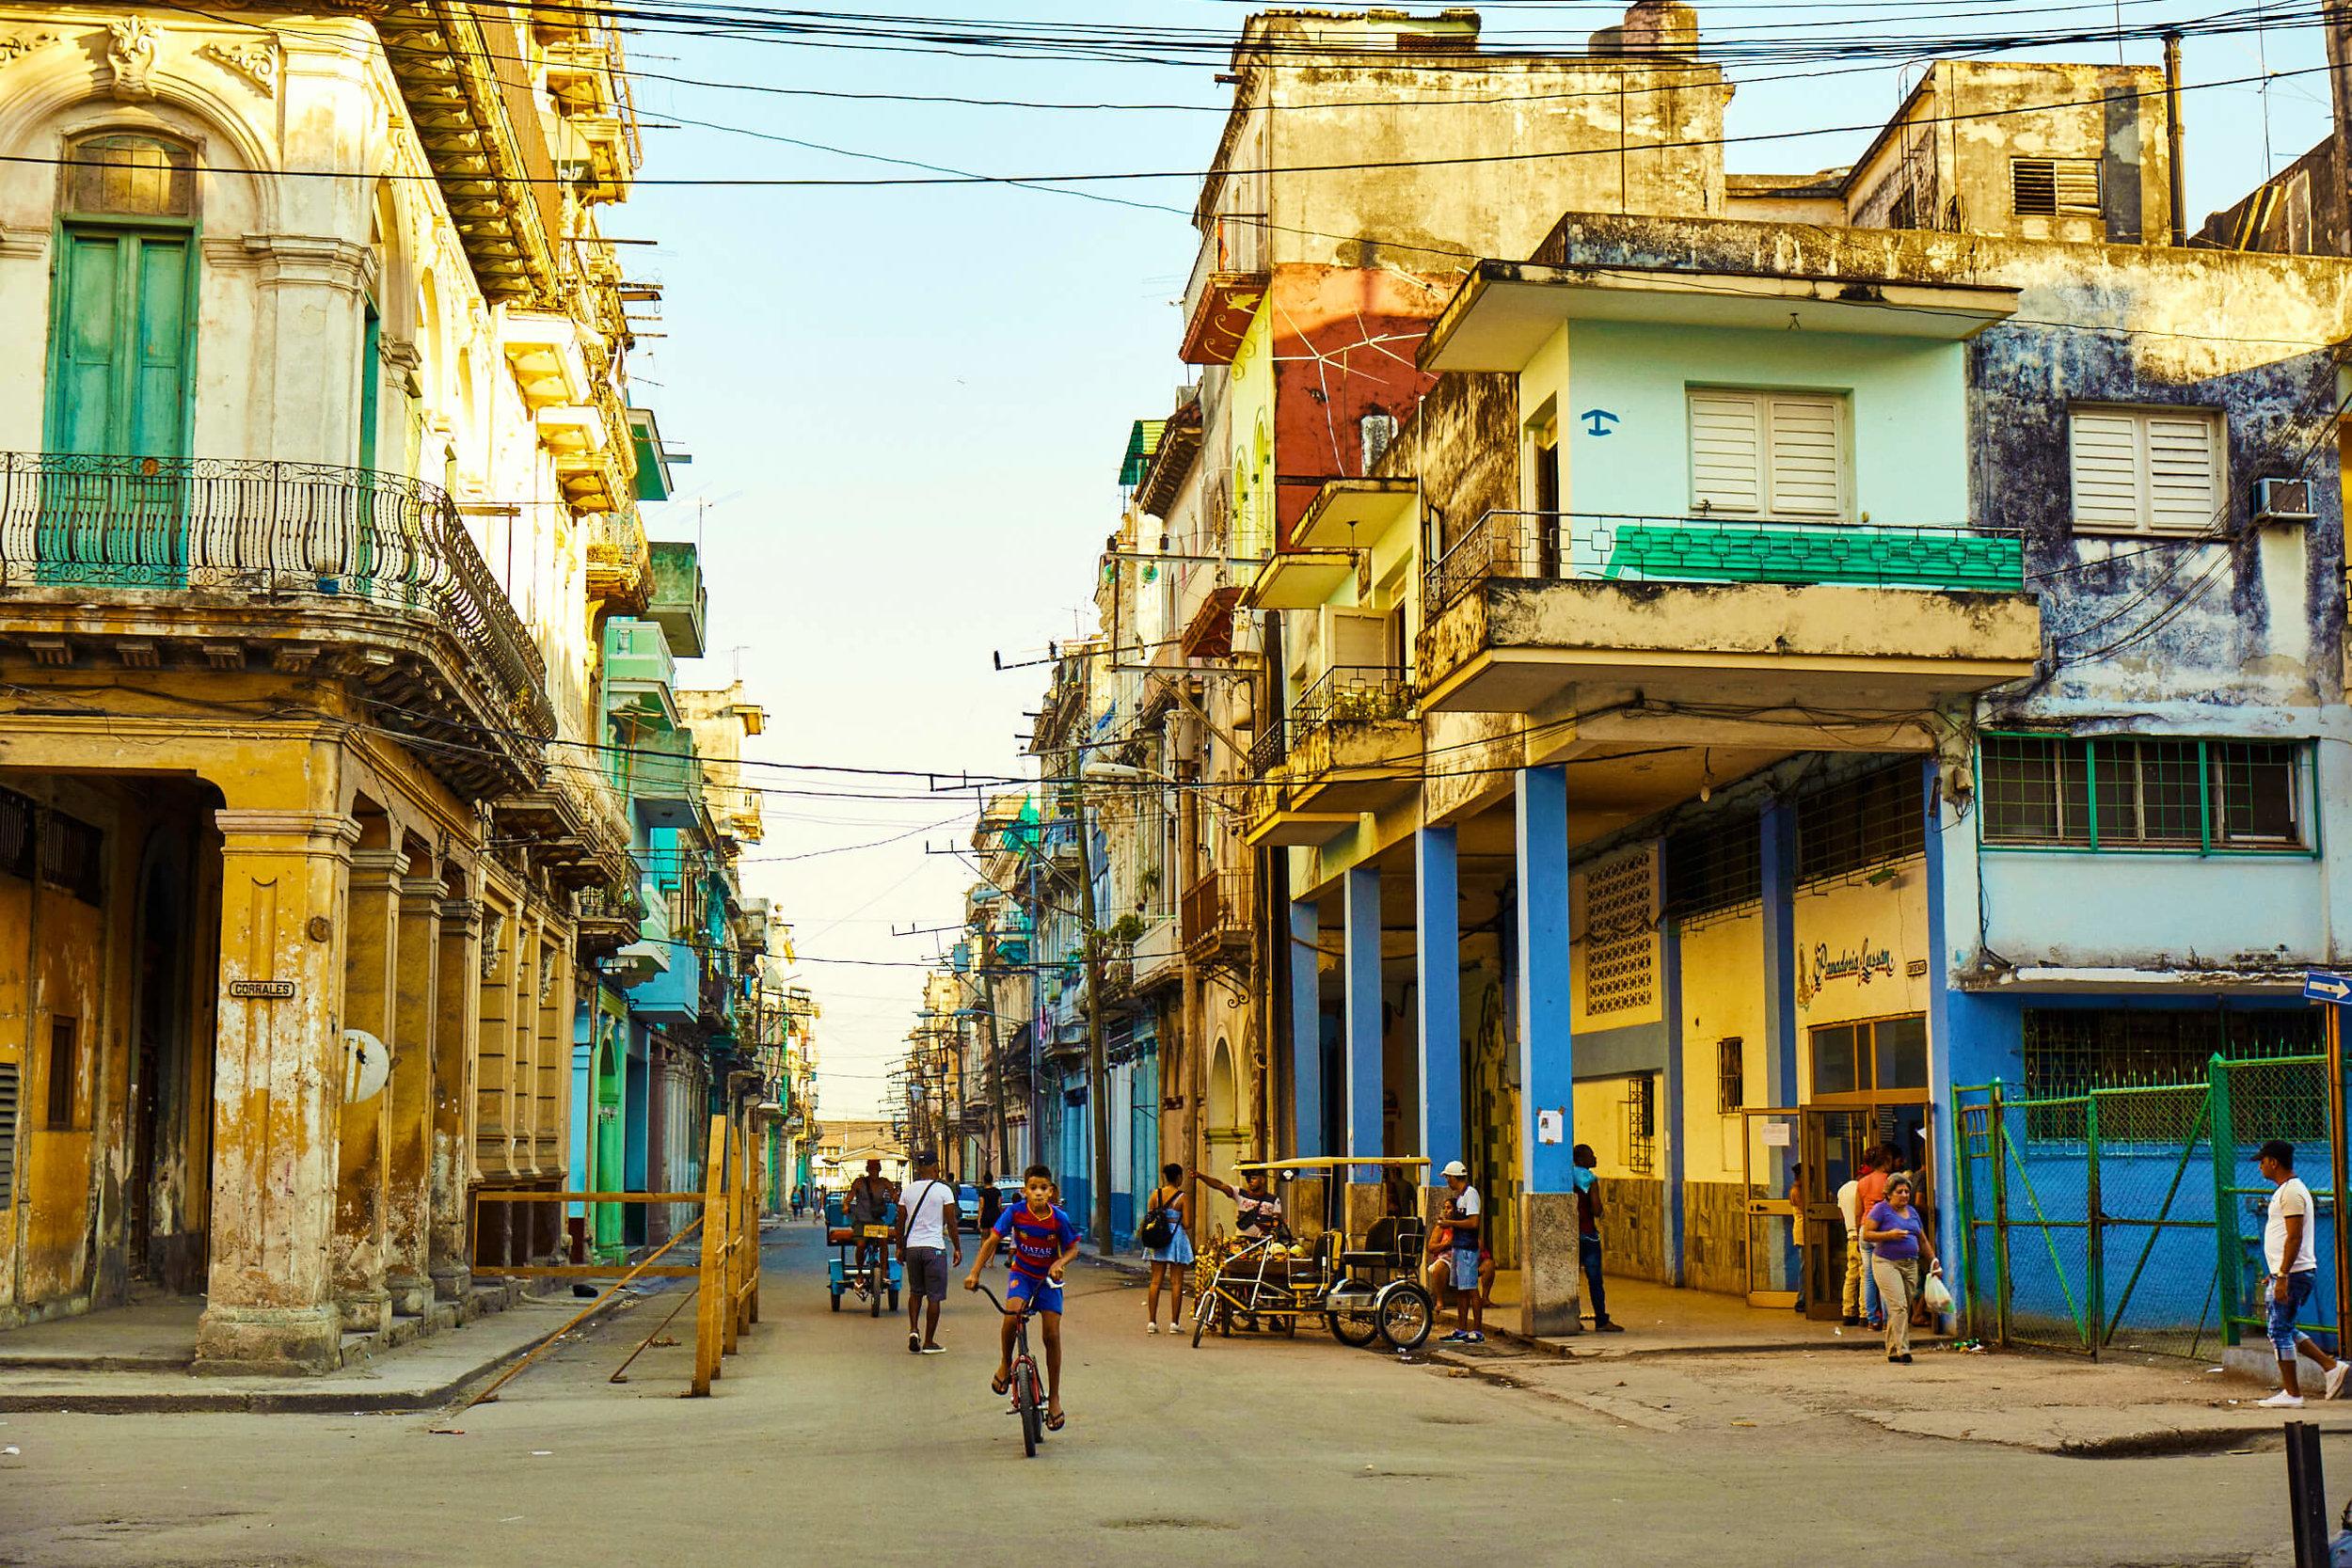 CUBA_CANDELA_old_havana_streets